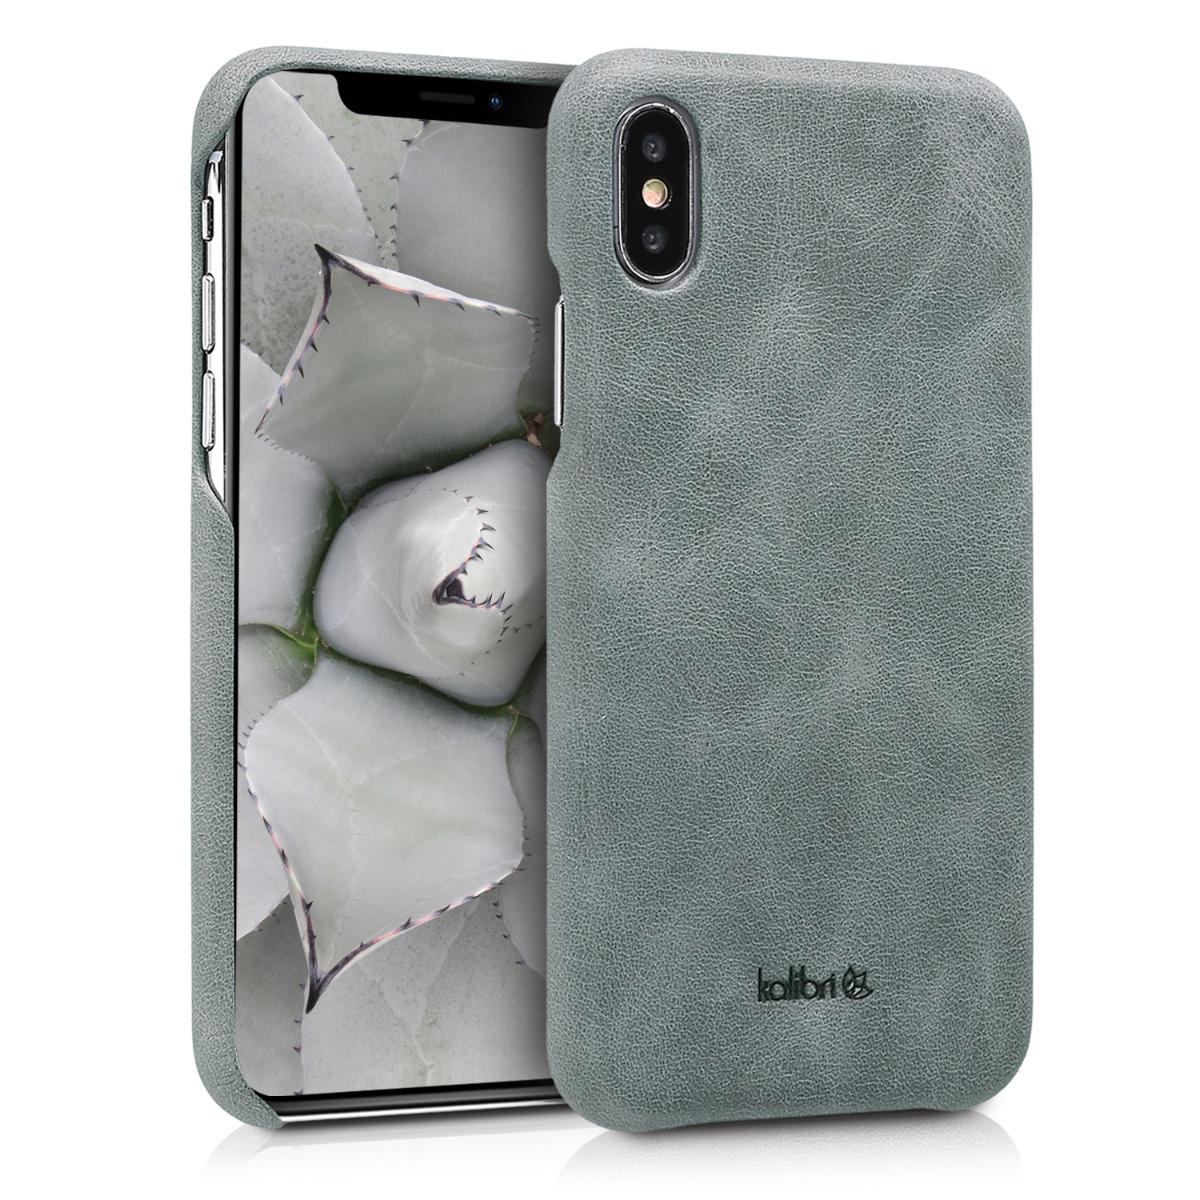 Kalibri Σκληρή Δερμάτινη Θήκη iPhone X - Γκρι (42516.19)